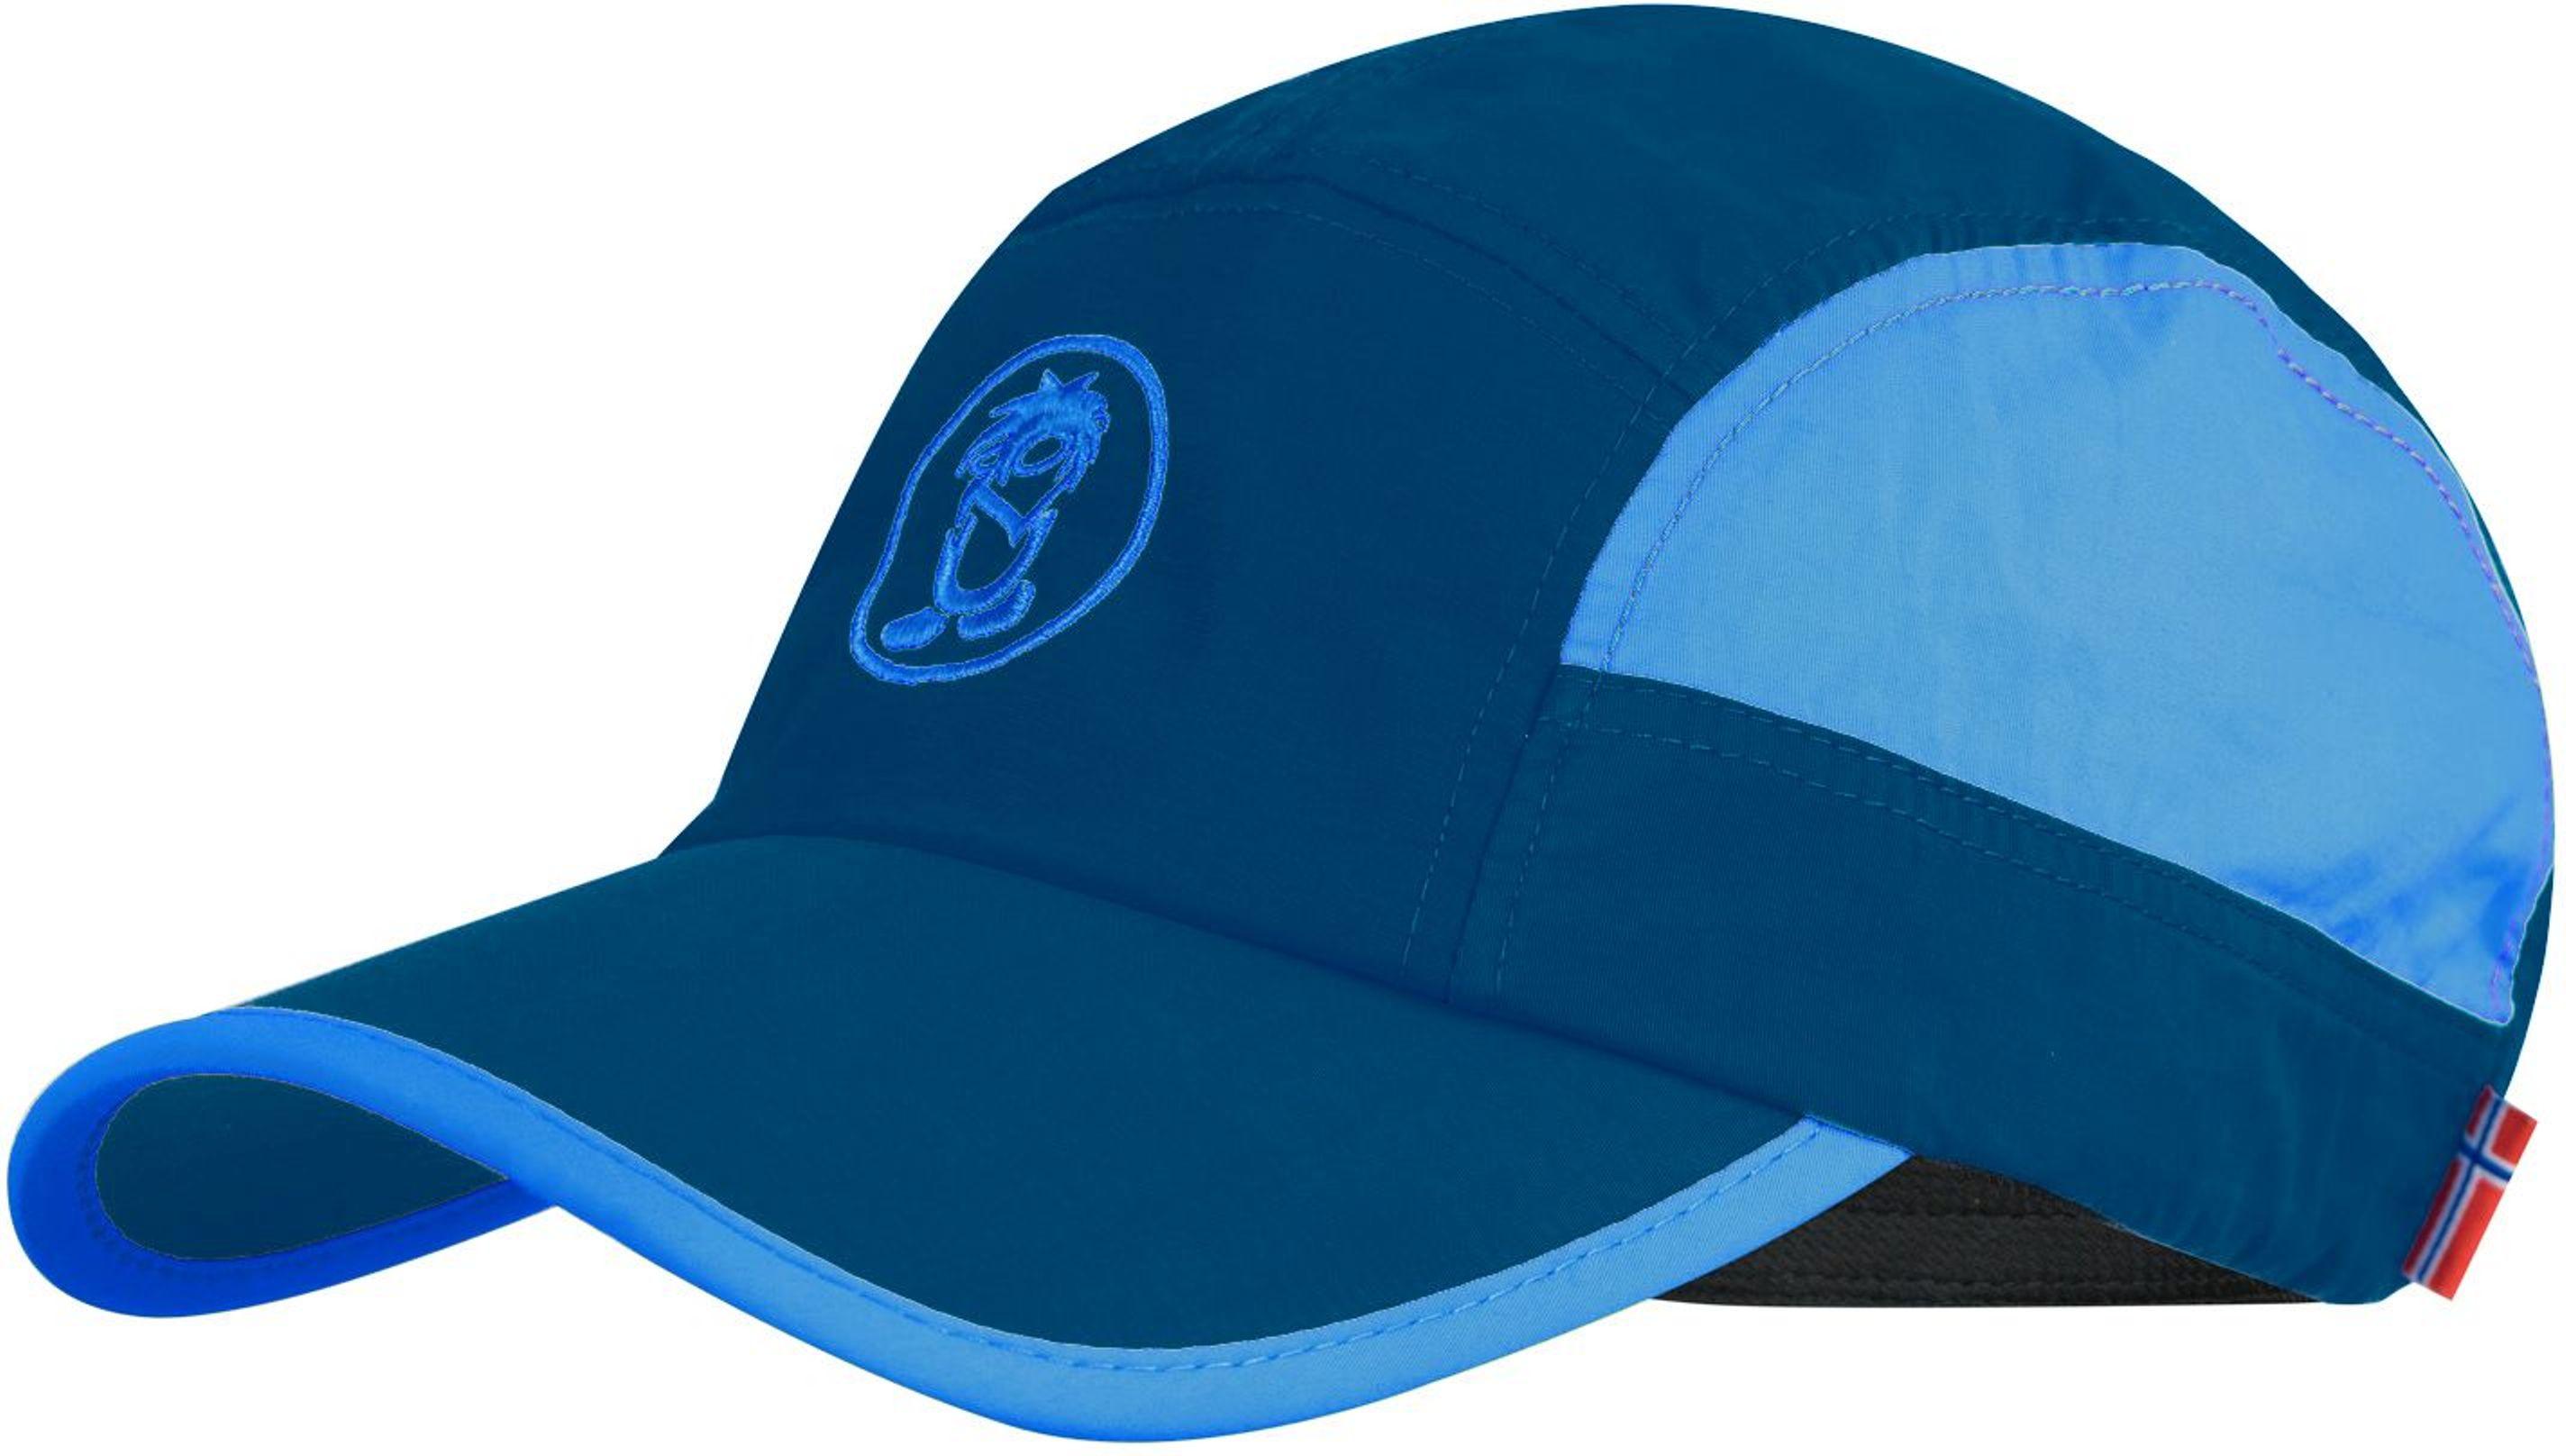 Trollkids Troll Cap navy/medium blue